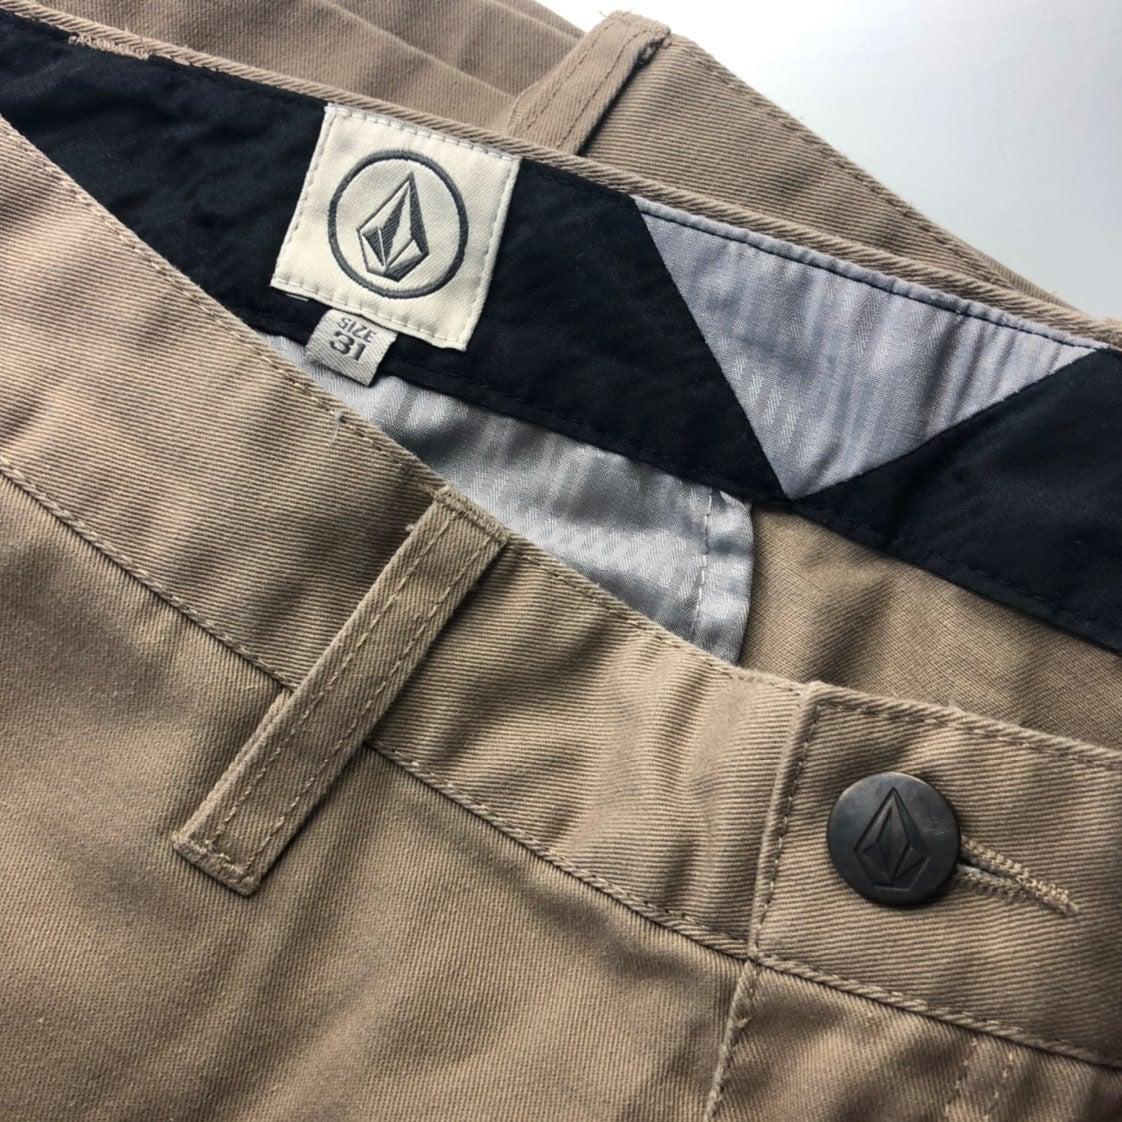 Men's Volcom light khaki shorts